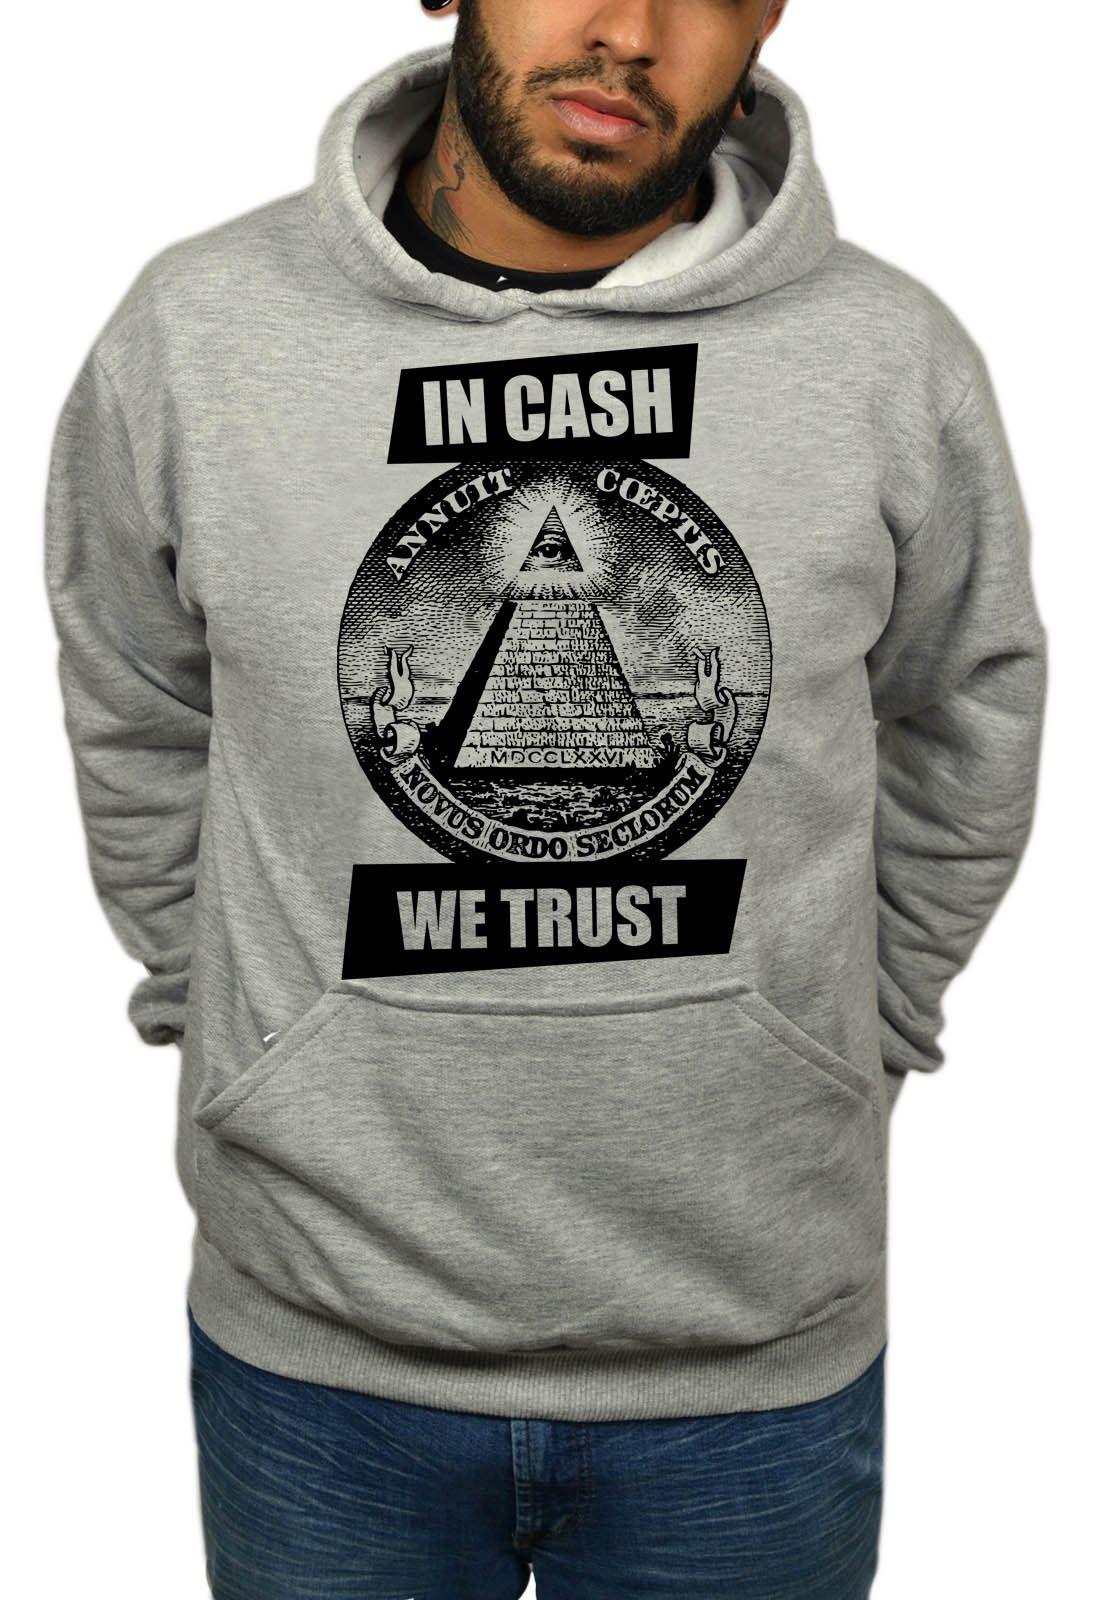 Moletom BUK In Cash We Trust - Cinza Mescla  - HShop